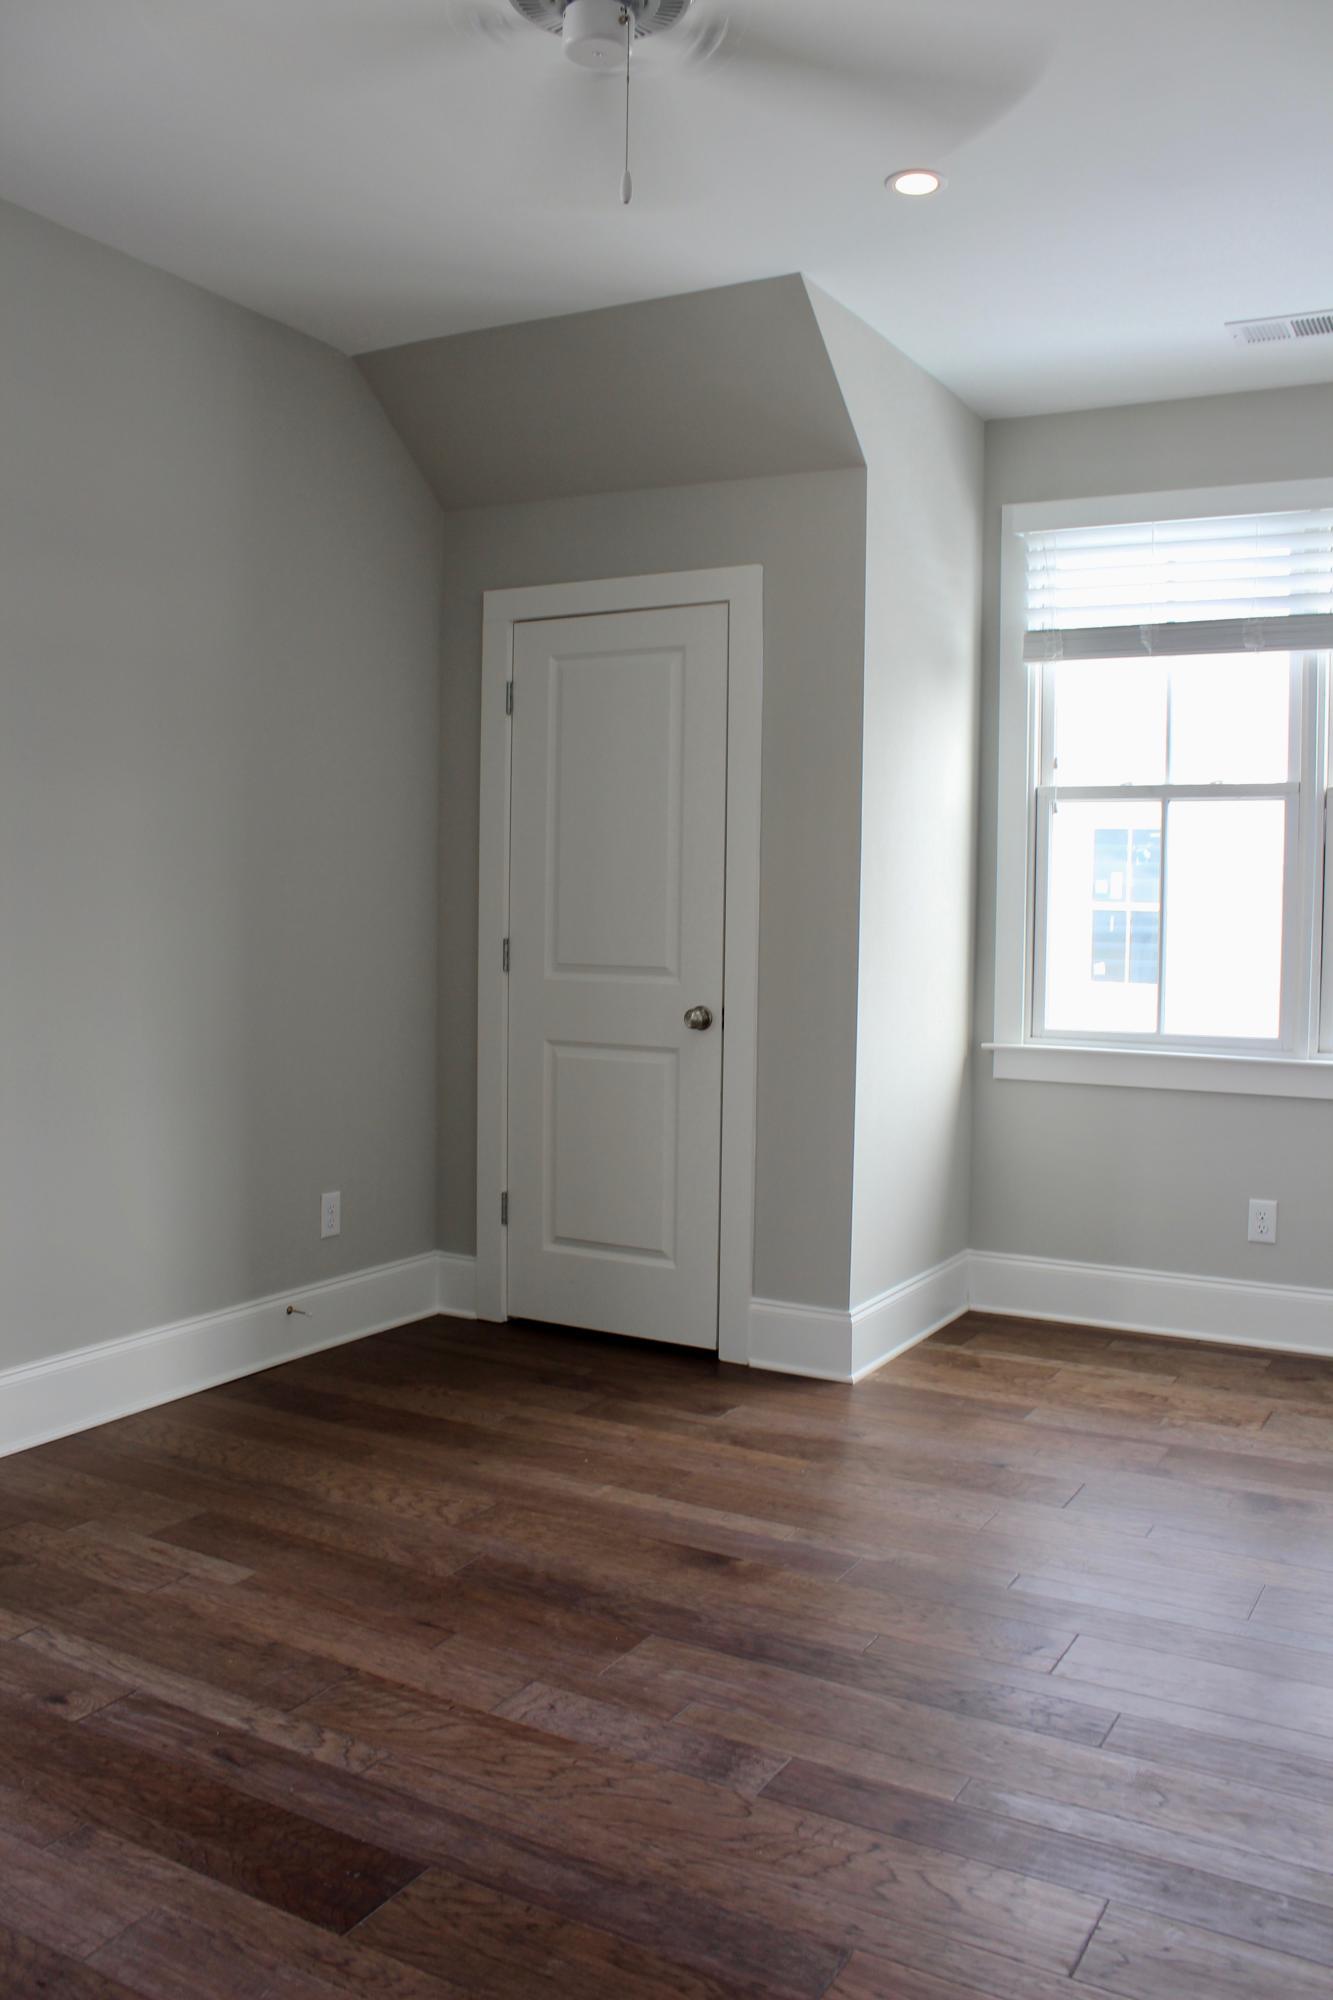 Morris Square Homes For Sale - 46 Dereef, Charleston, SC - 14